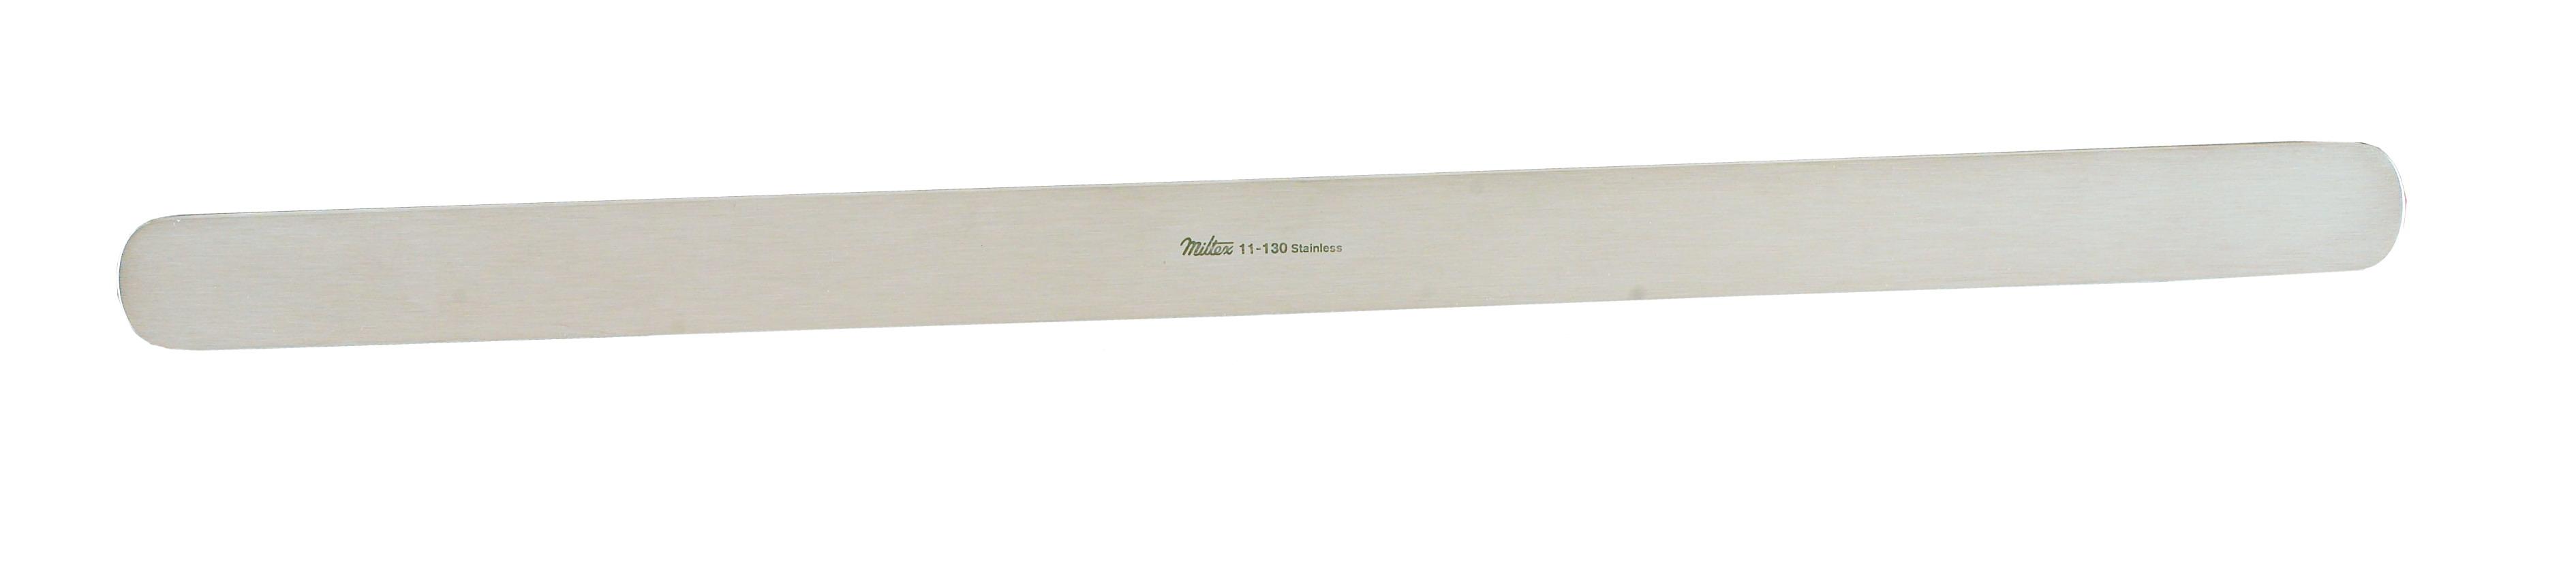 ribbon-retractor-3-4-19-cm-x-13-33-cm-malleable-11-130-miltex.jpg